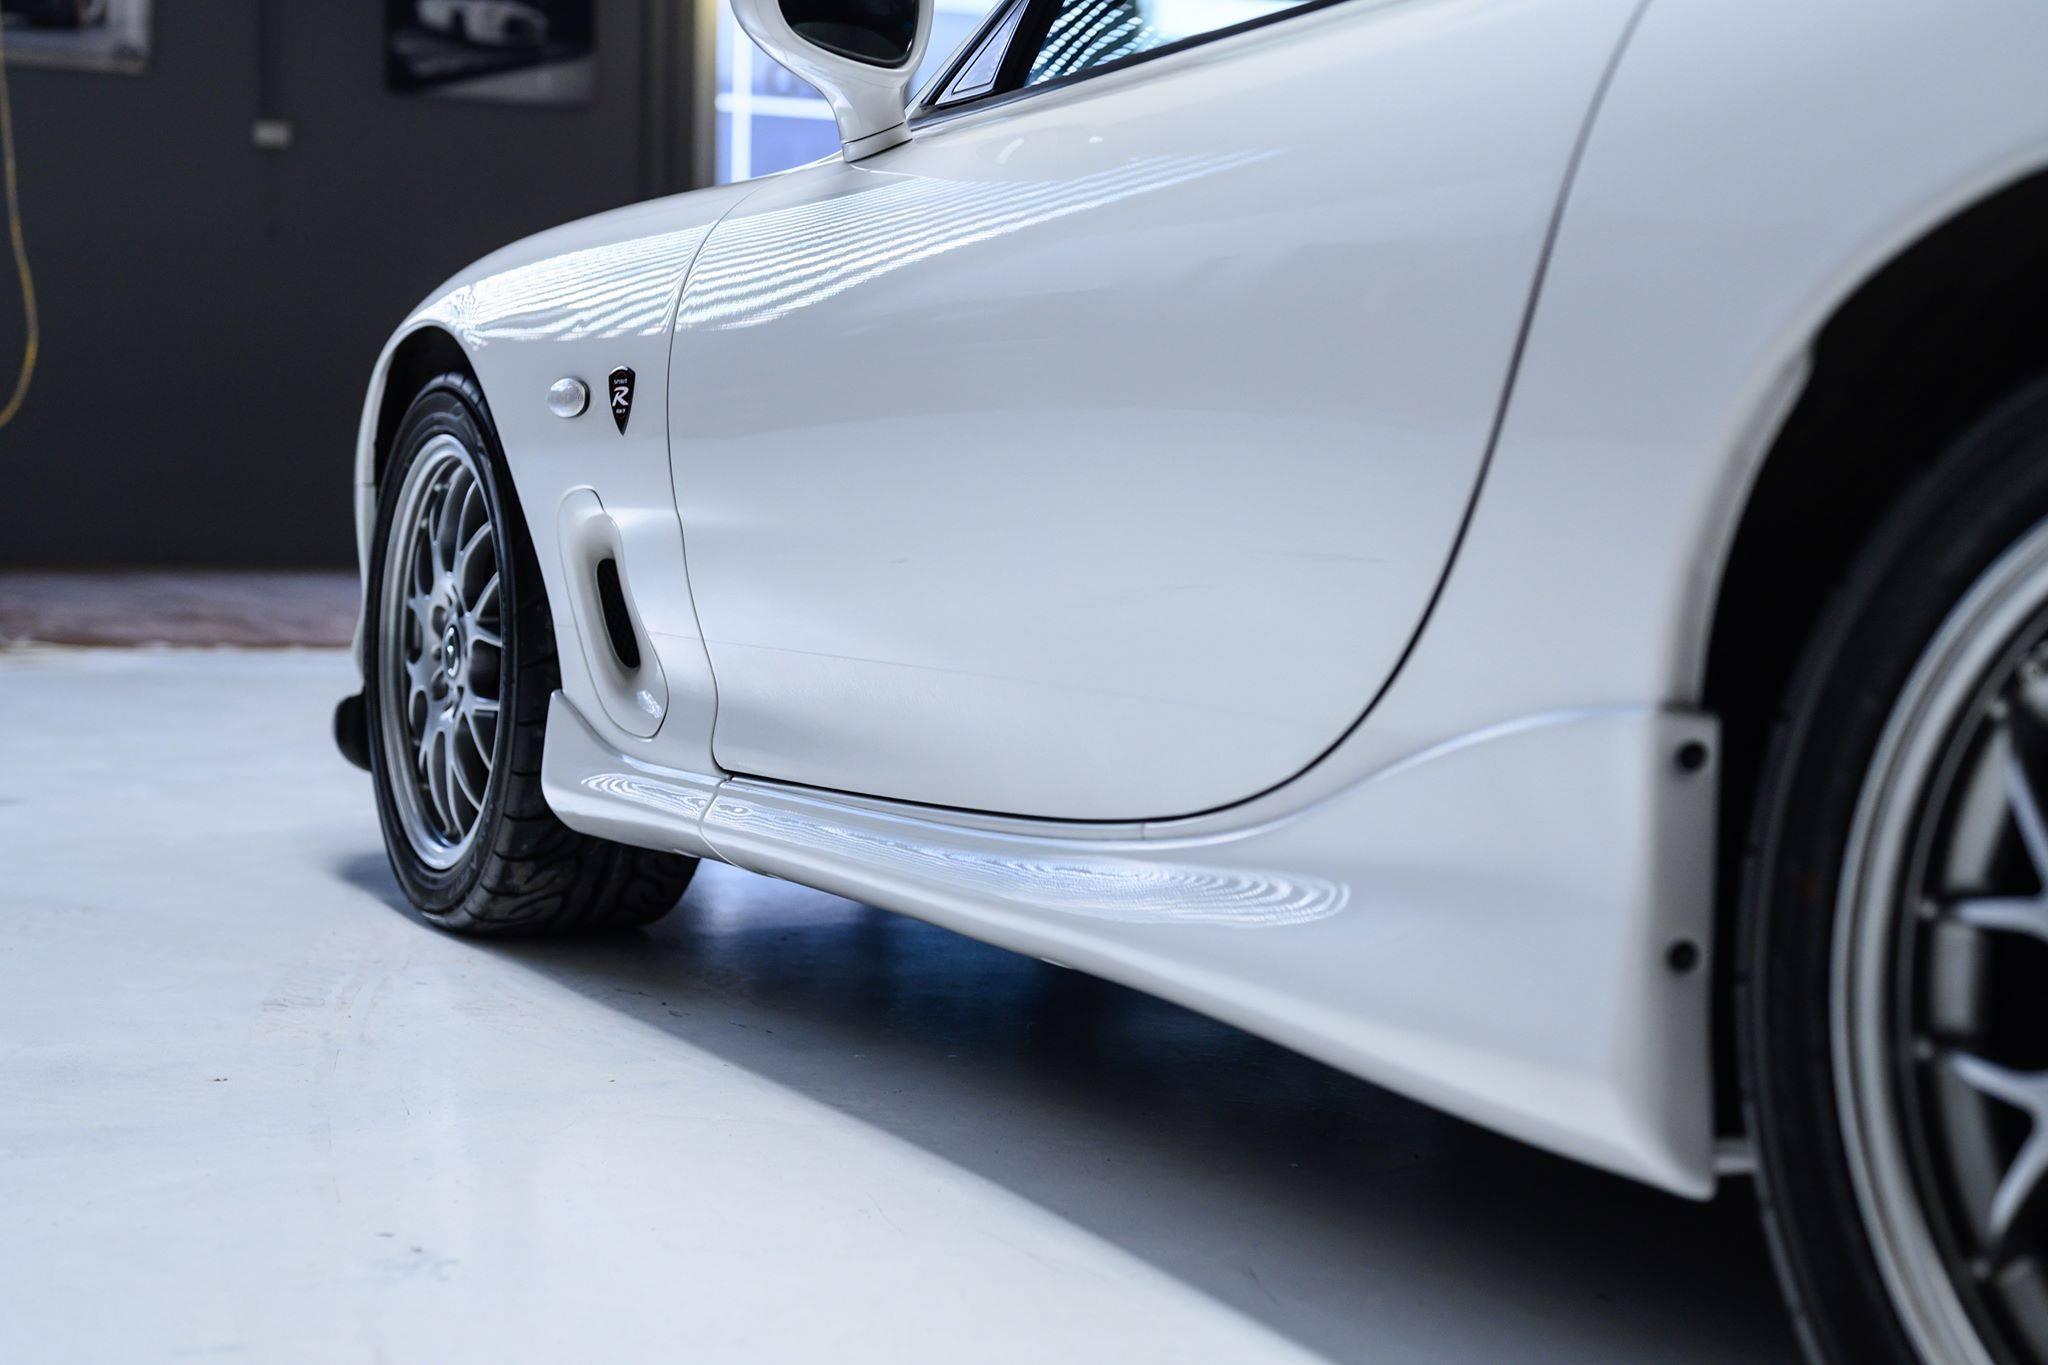 2002_Mazda_RX-7_Spirit-R_Type-A_sale_0001